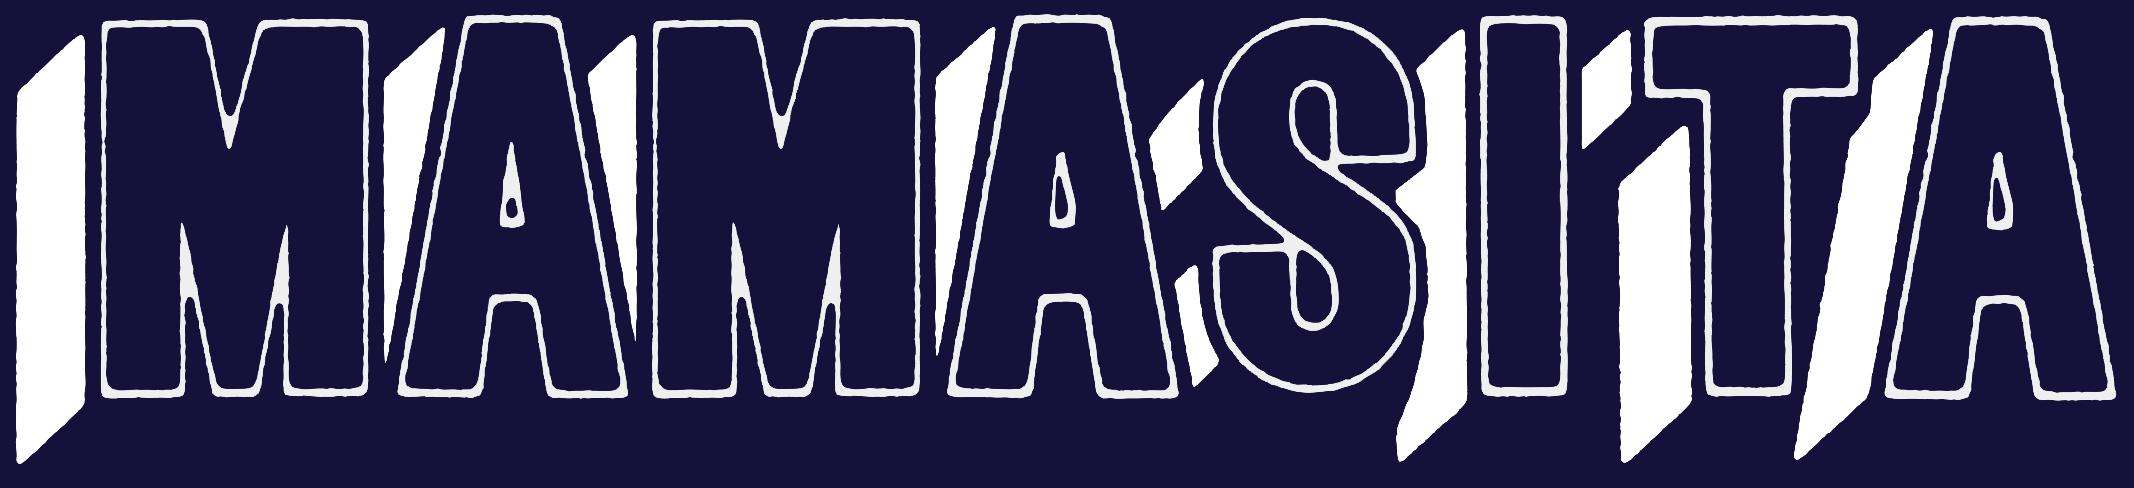 Mamasita logo